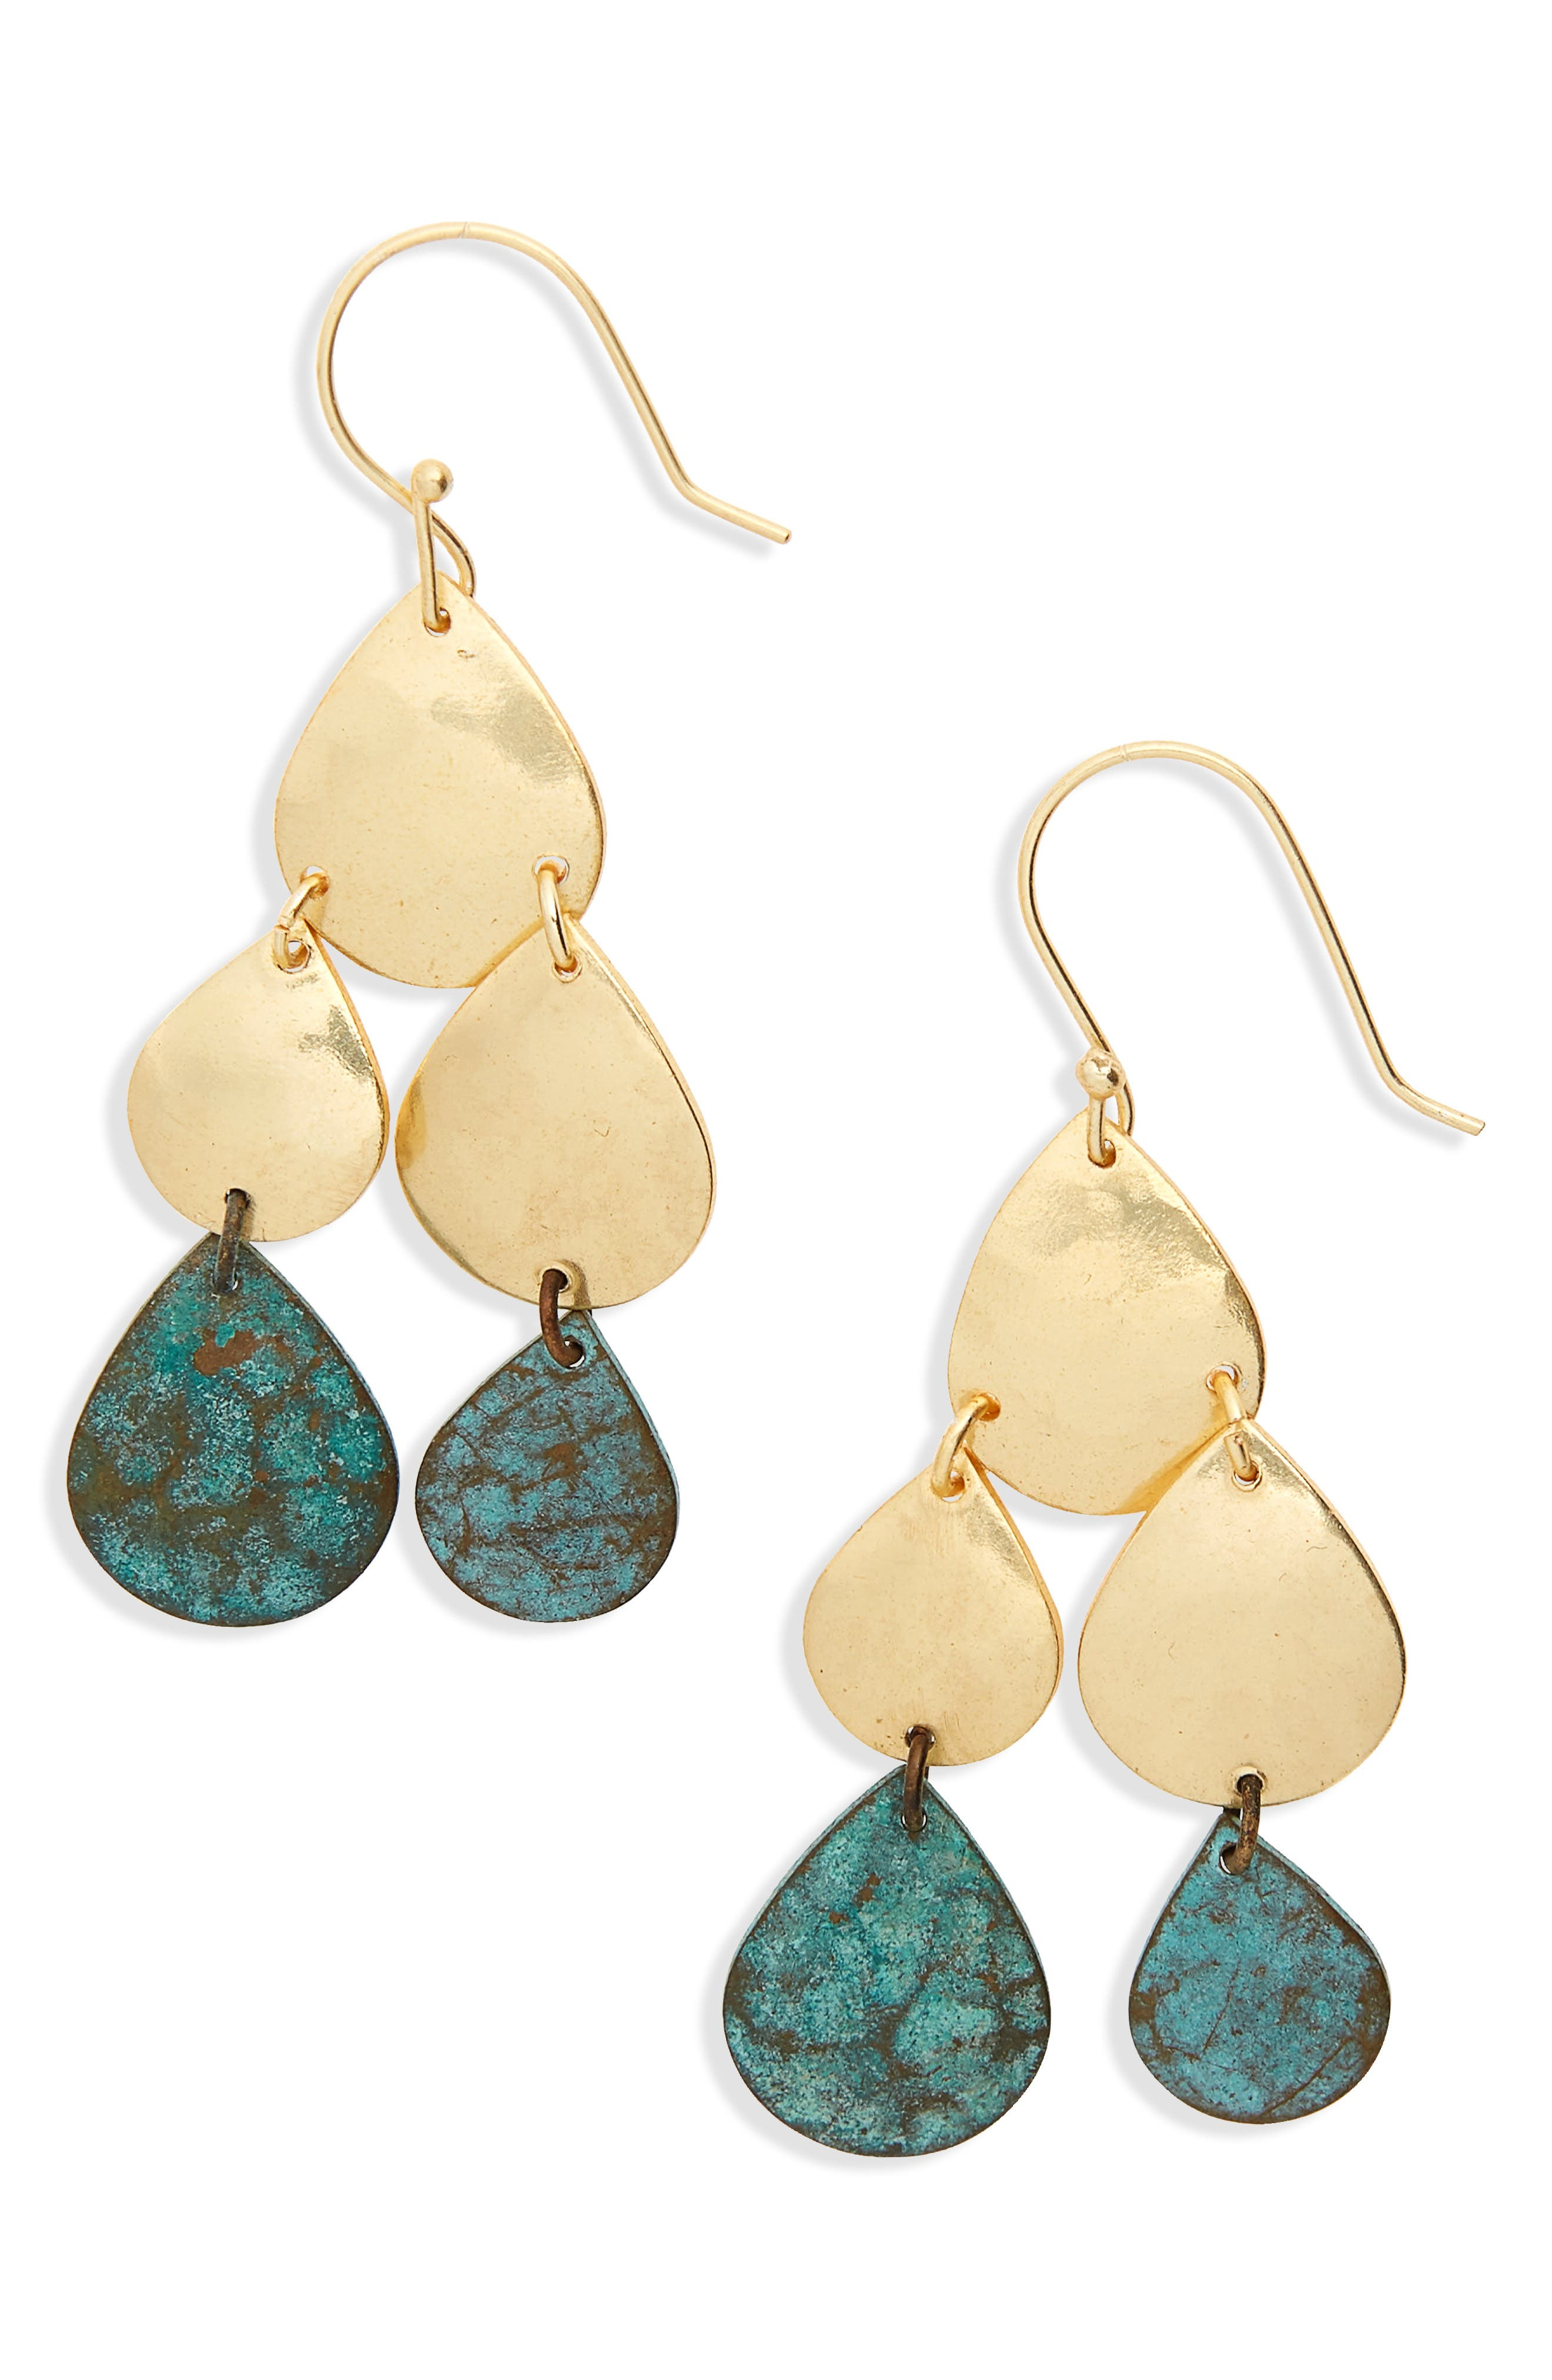 Patina Teardrops Earrings,                         Main,                         color, Gold/ Multi